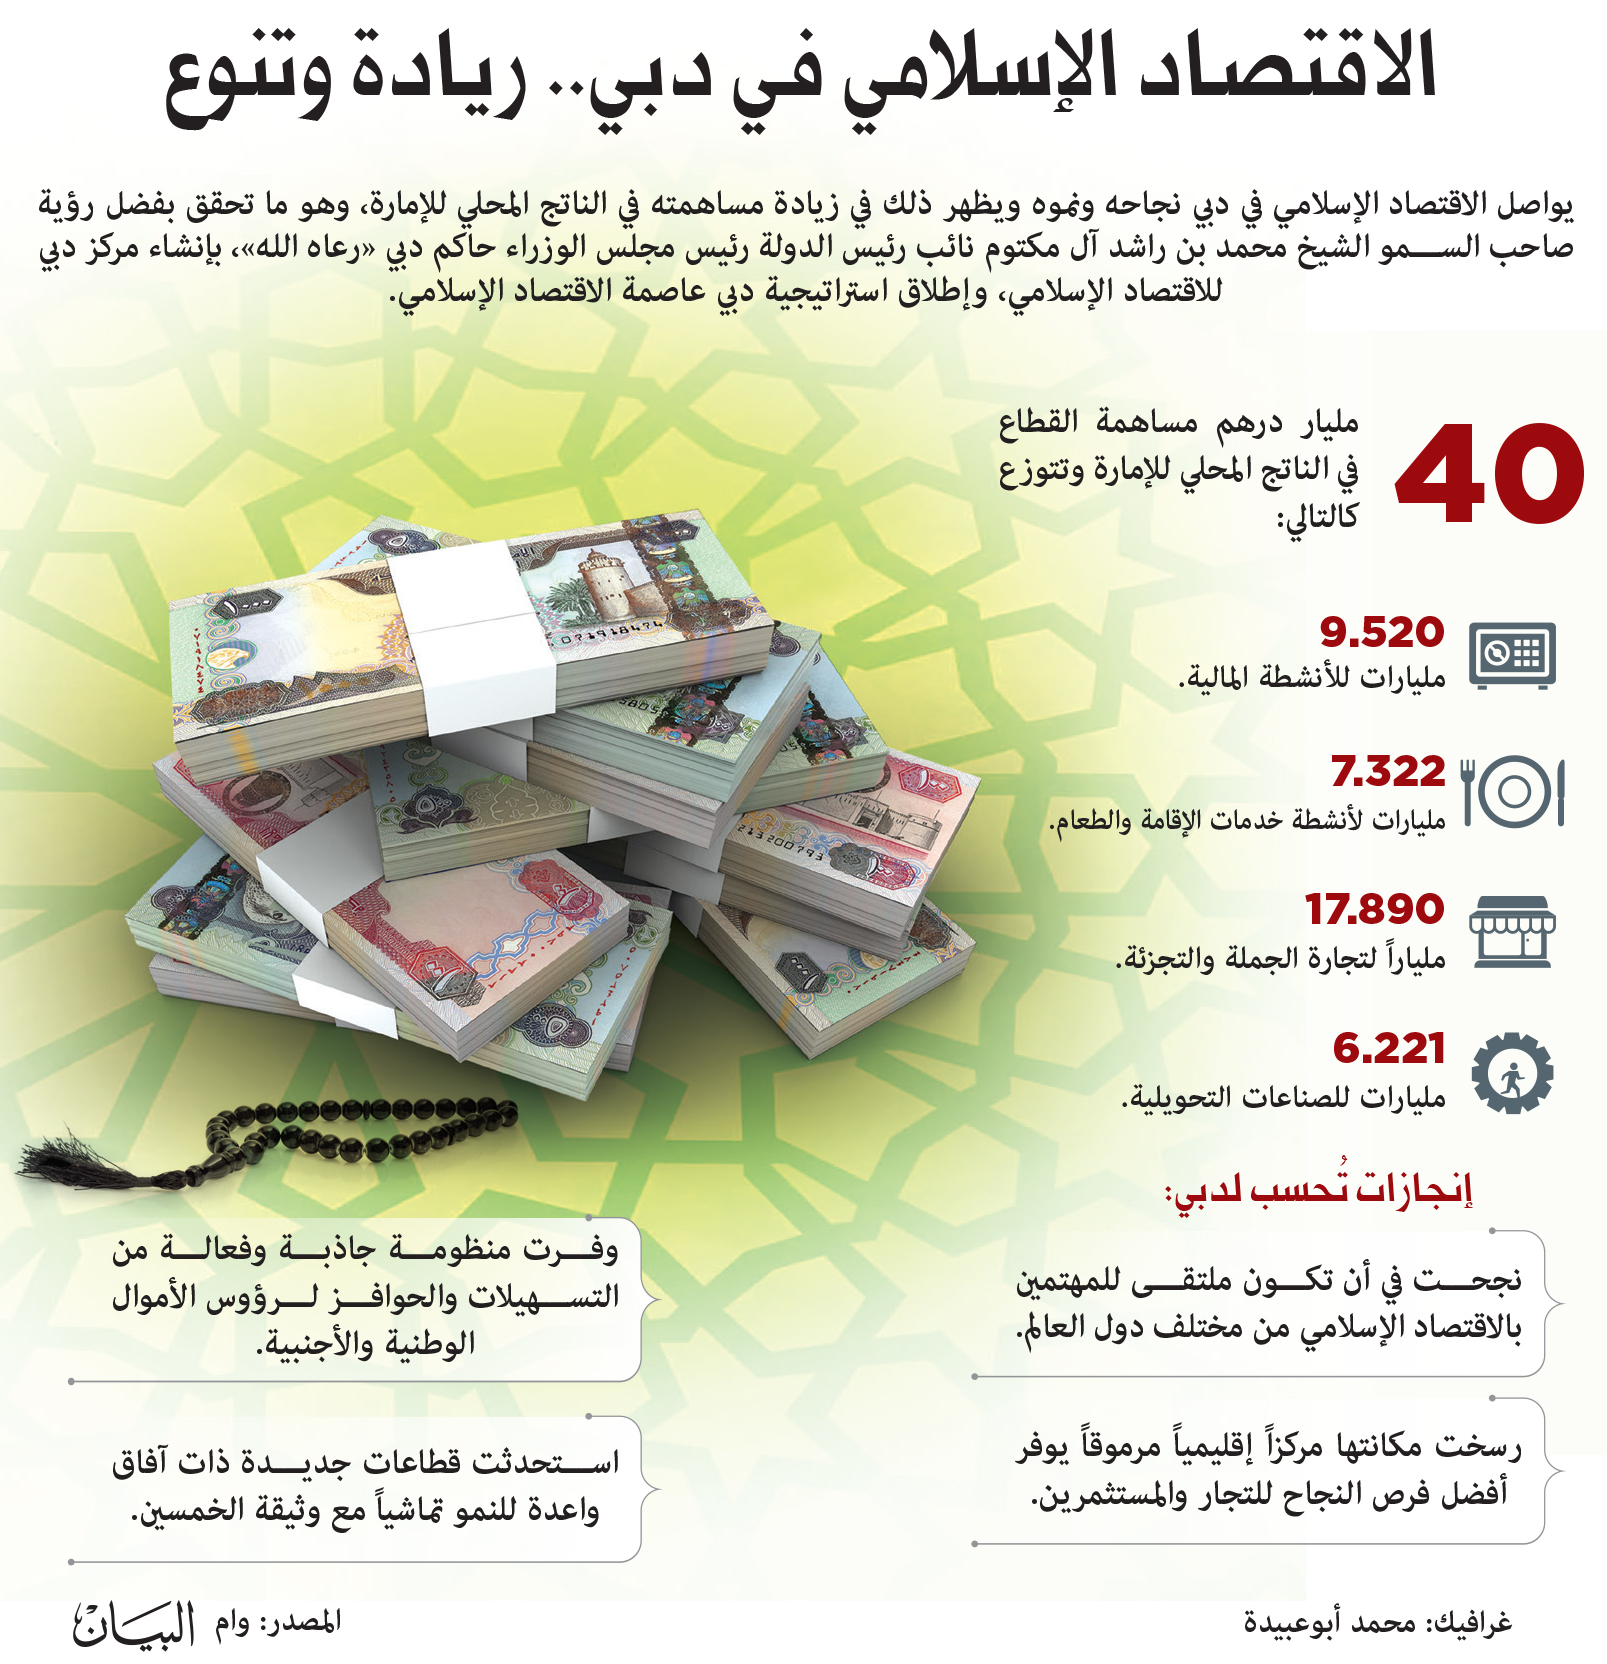 The vision of Mohammed bin Rashid made Dubai the capital of